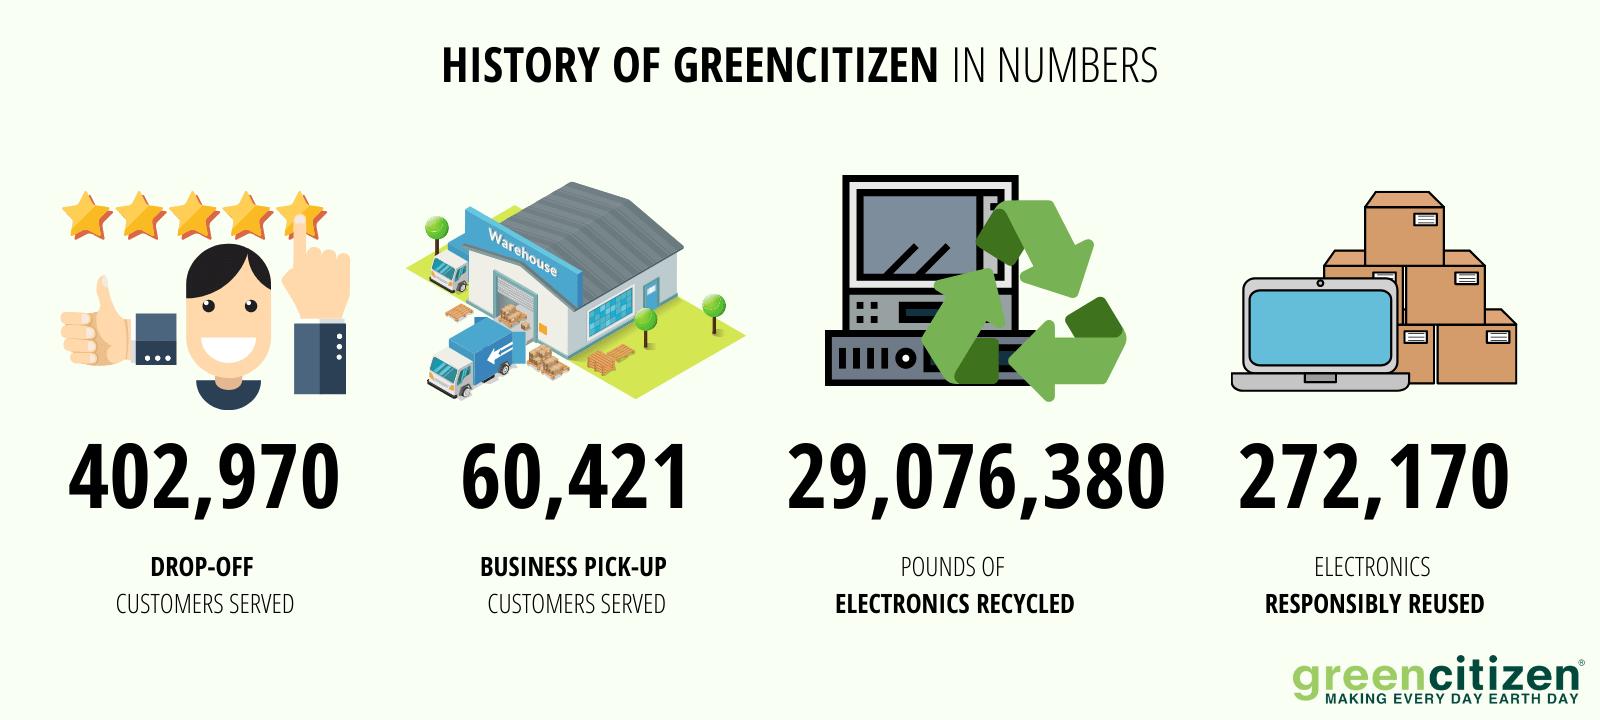 GreenCitizen History